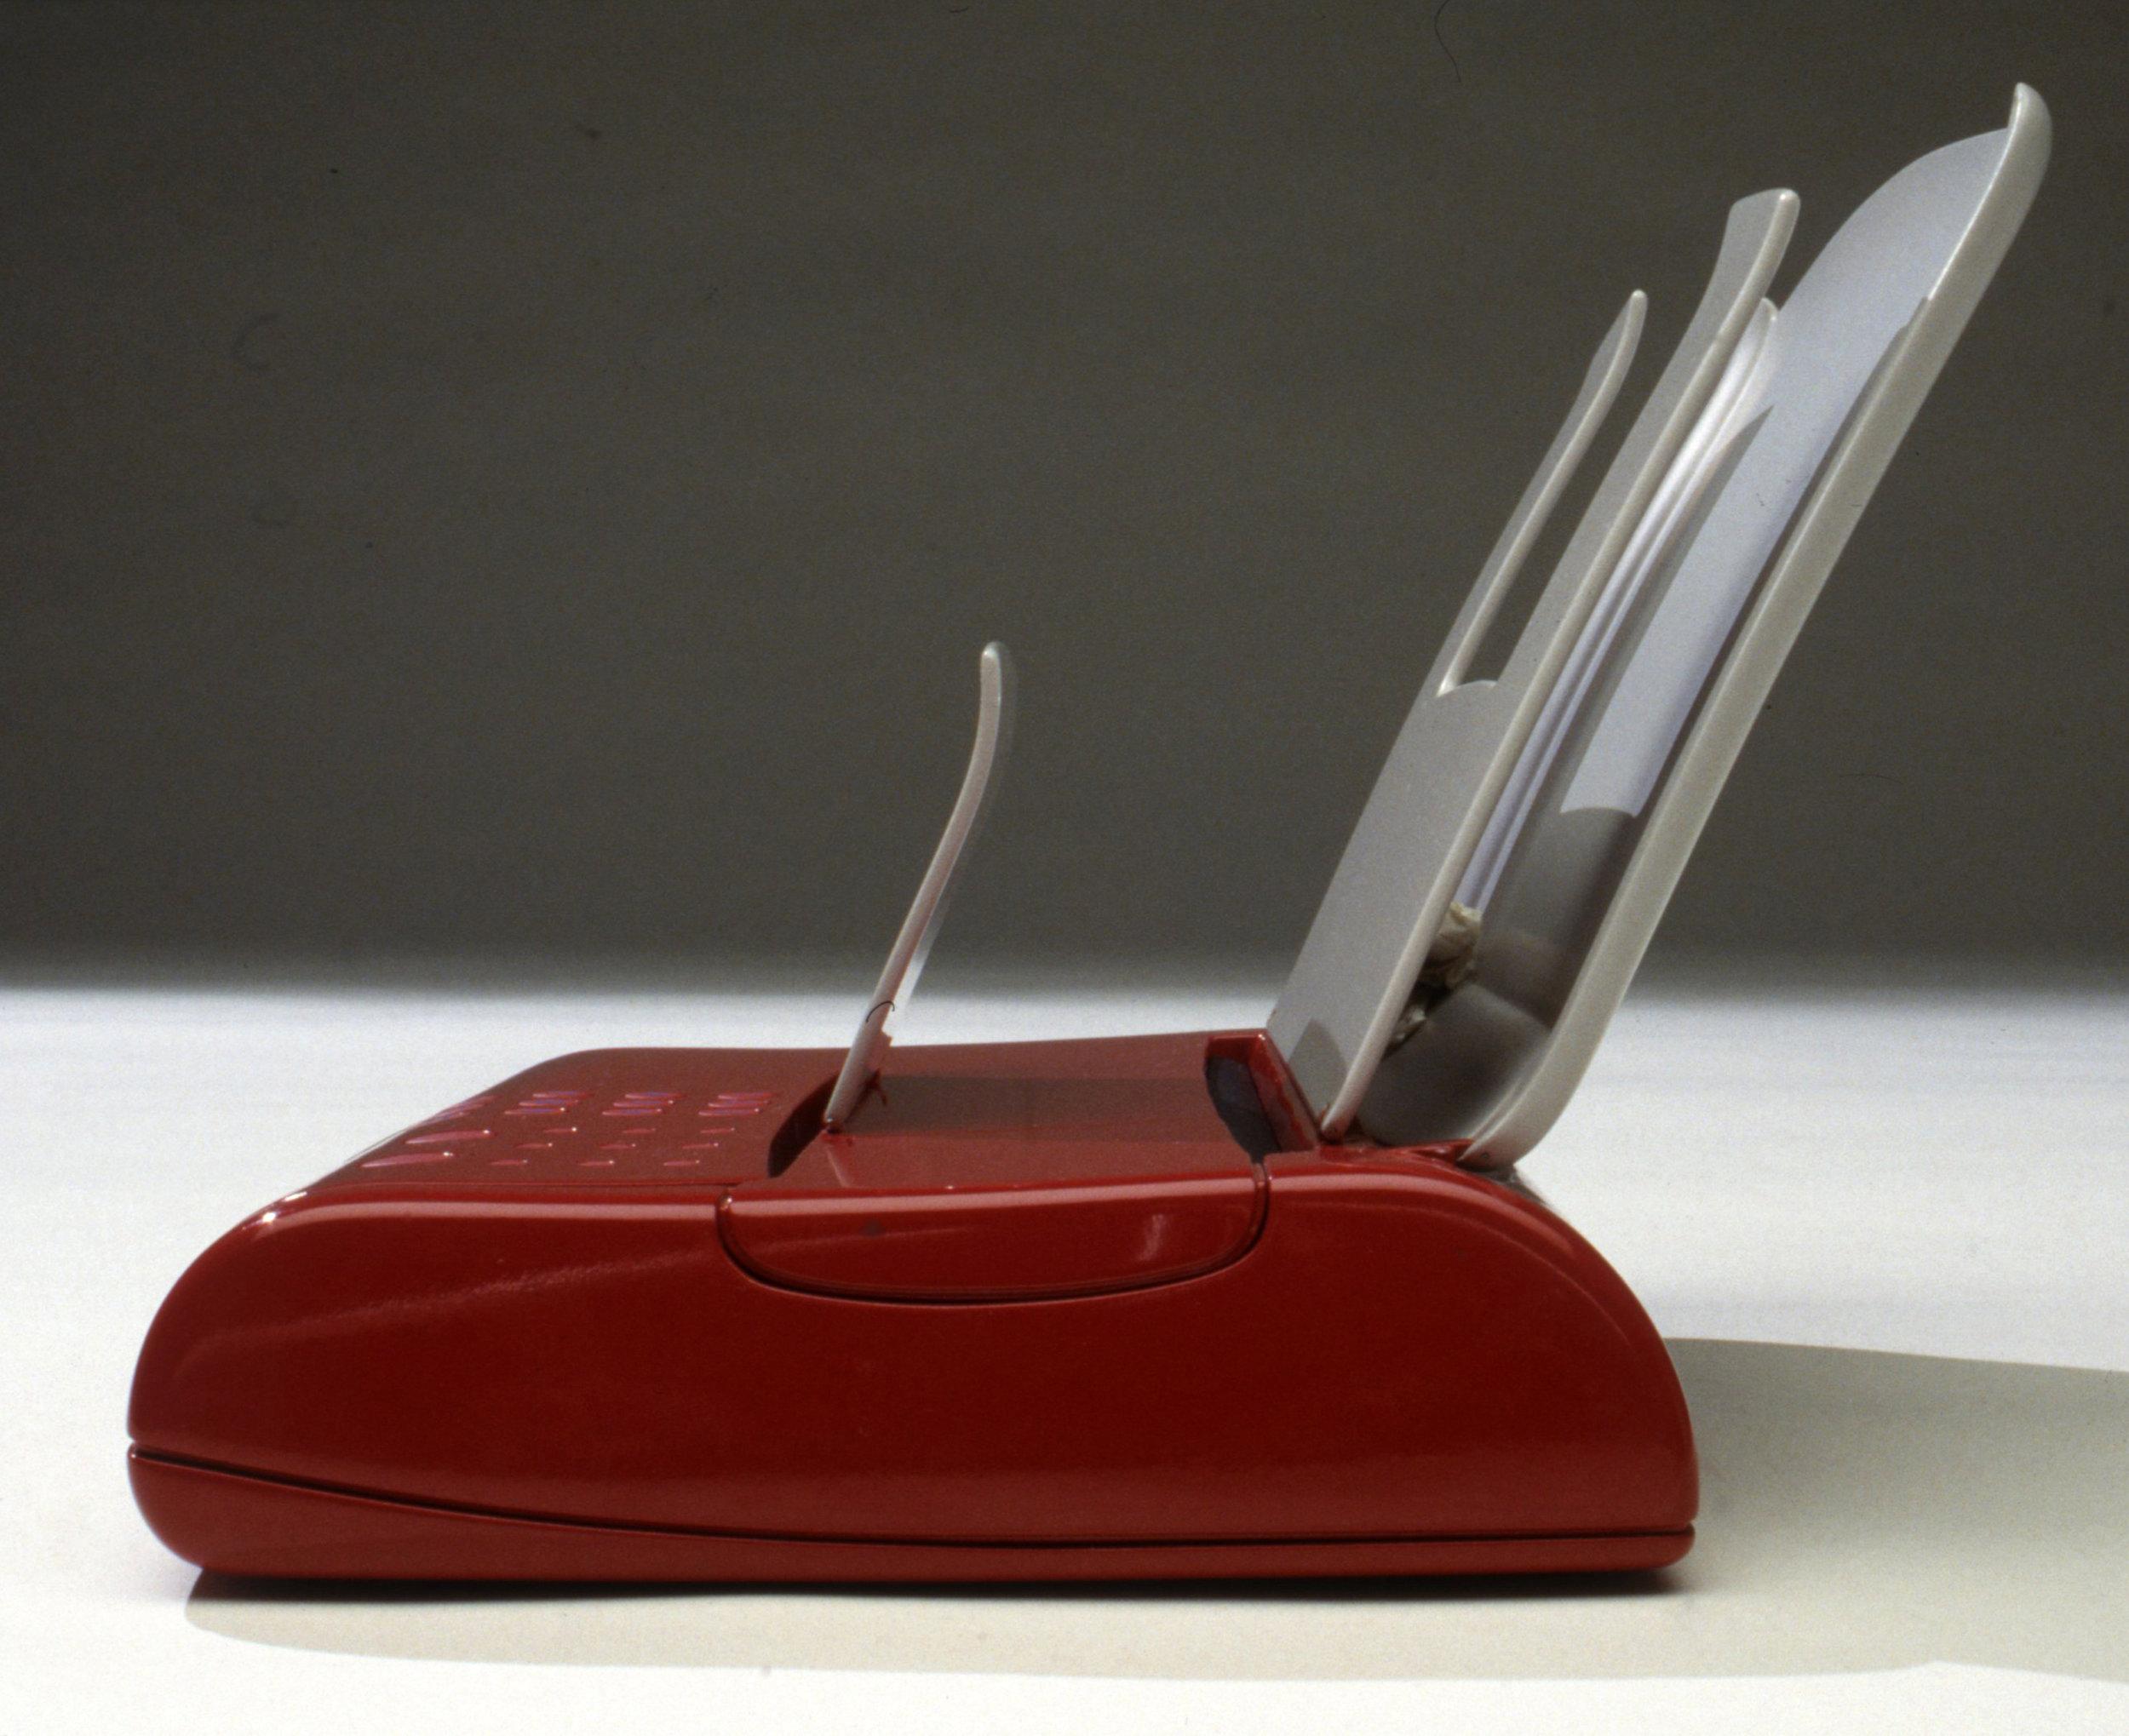 2 Olivetti_Model_Fax_Red_Photos(06).jpg